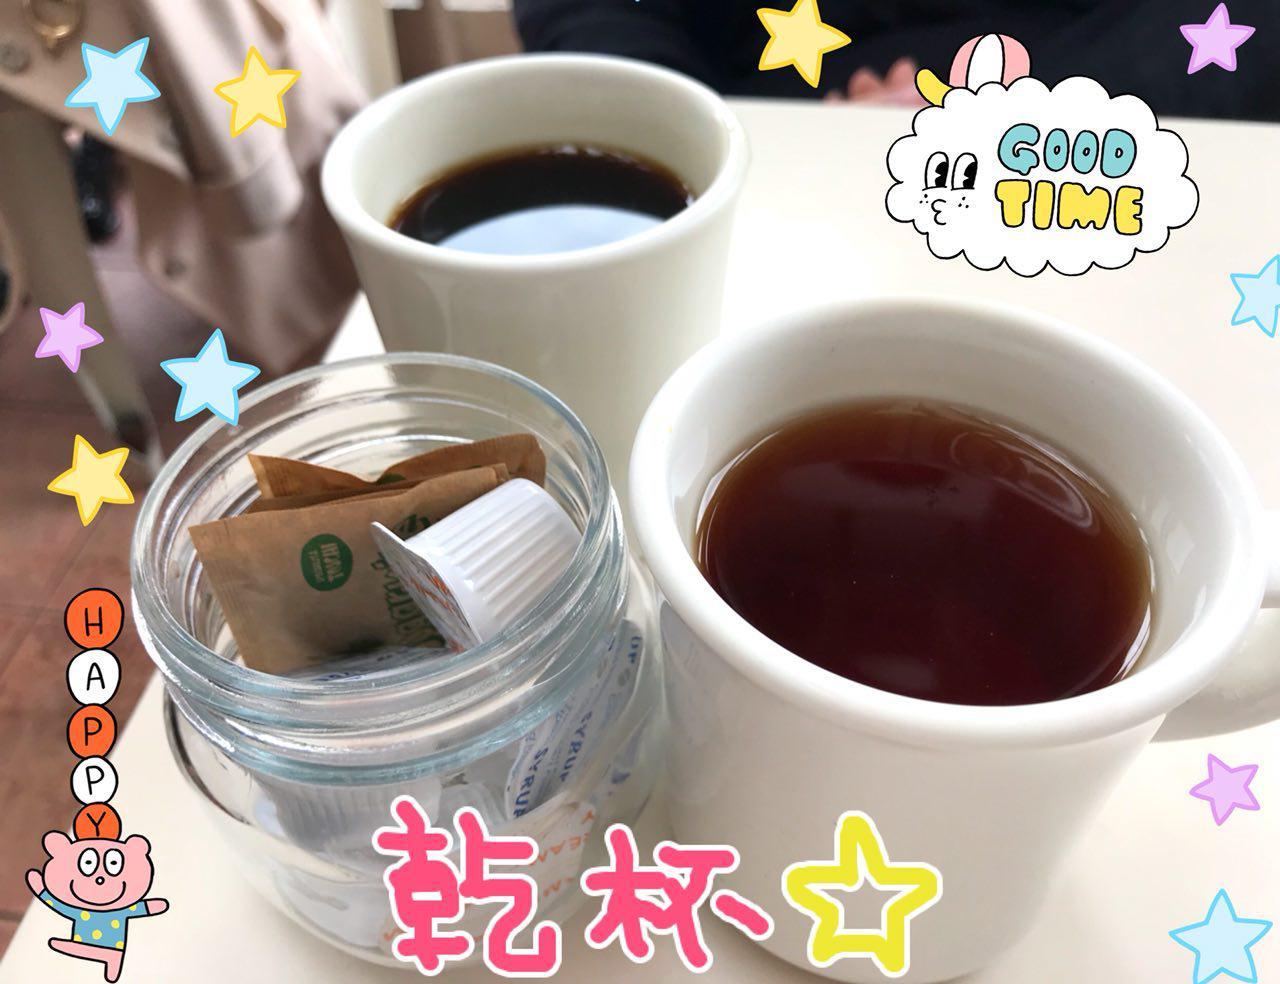 photo_2018-02-25_21-05-51.jpg